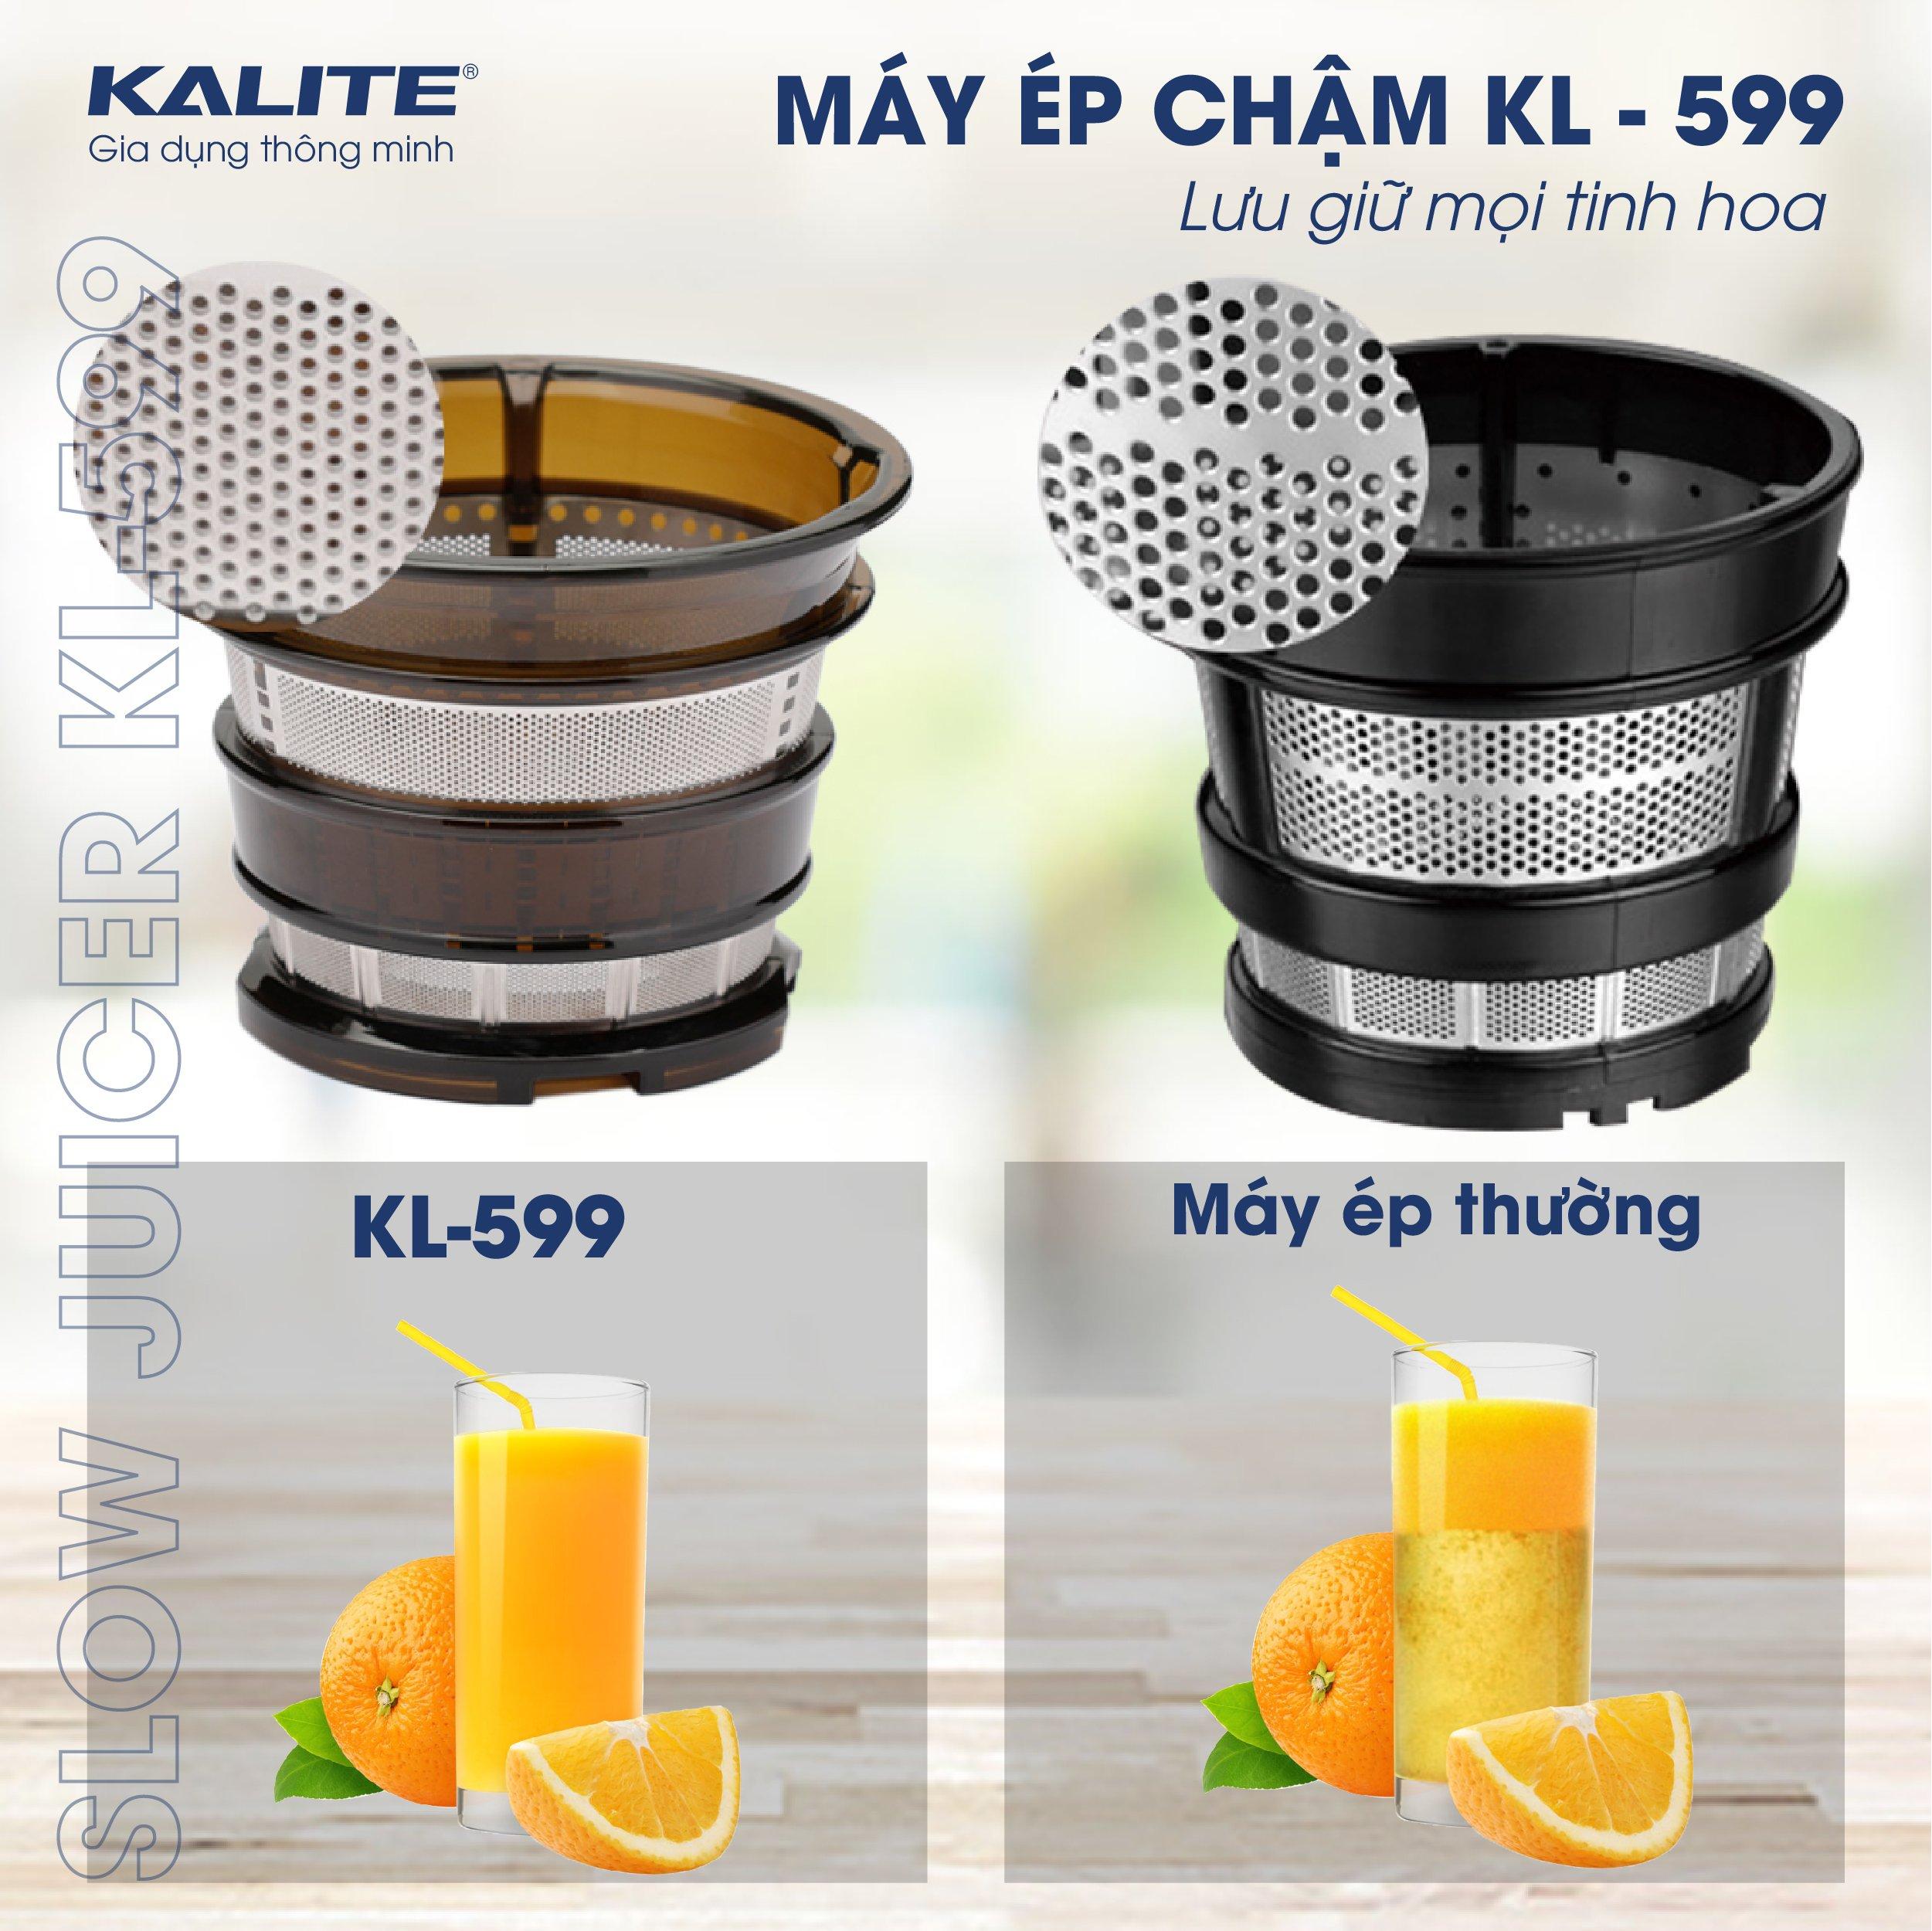 may-ep-cham-trai-cay-kalite-kl-599-loc-ba-thong-minh